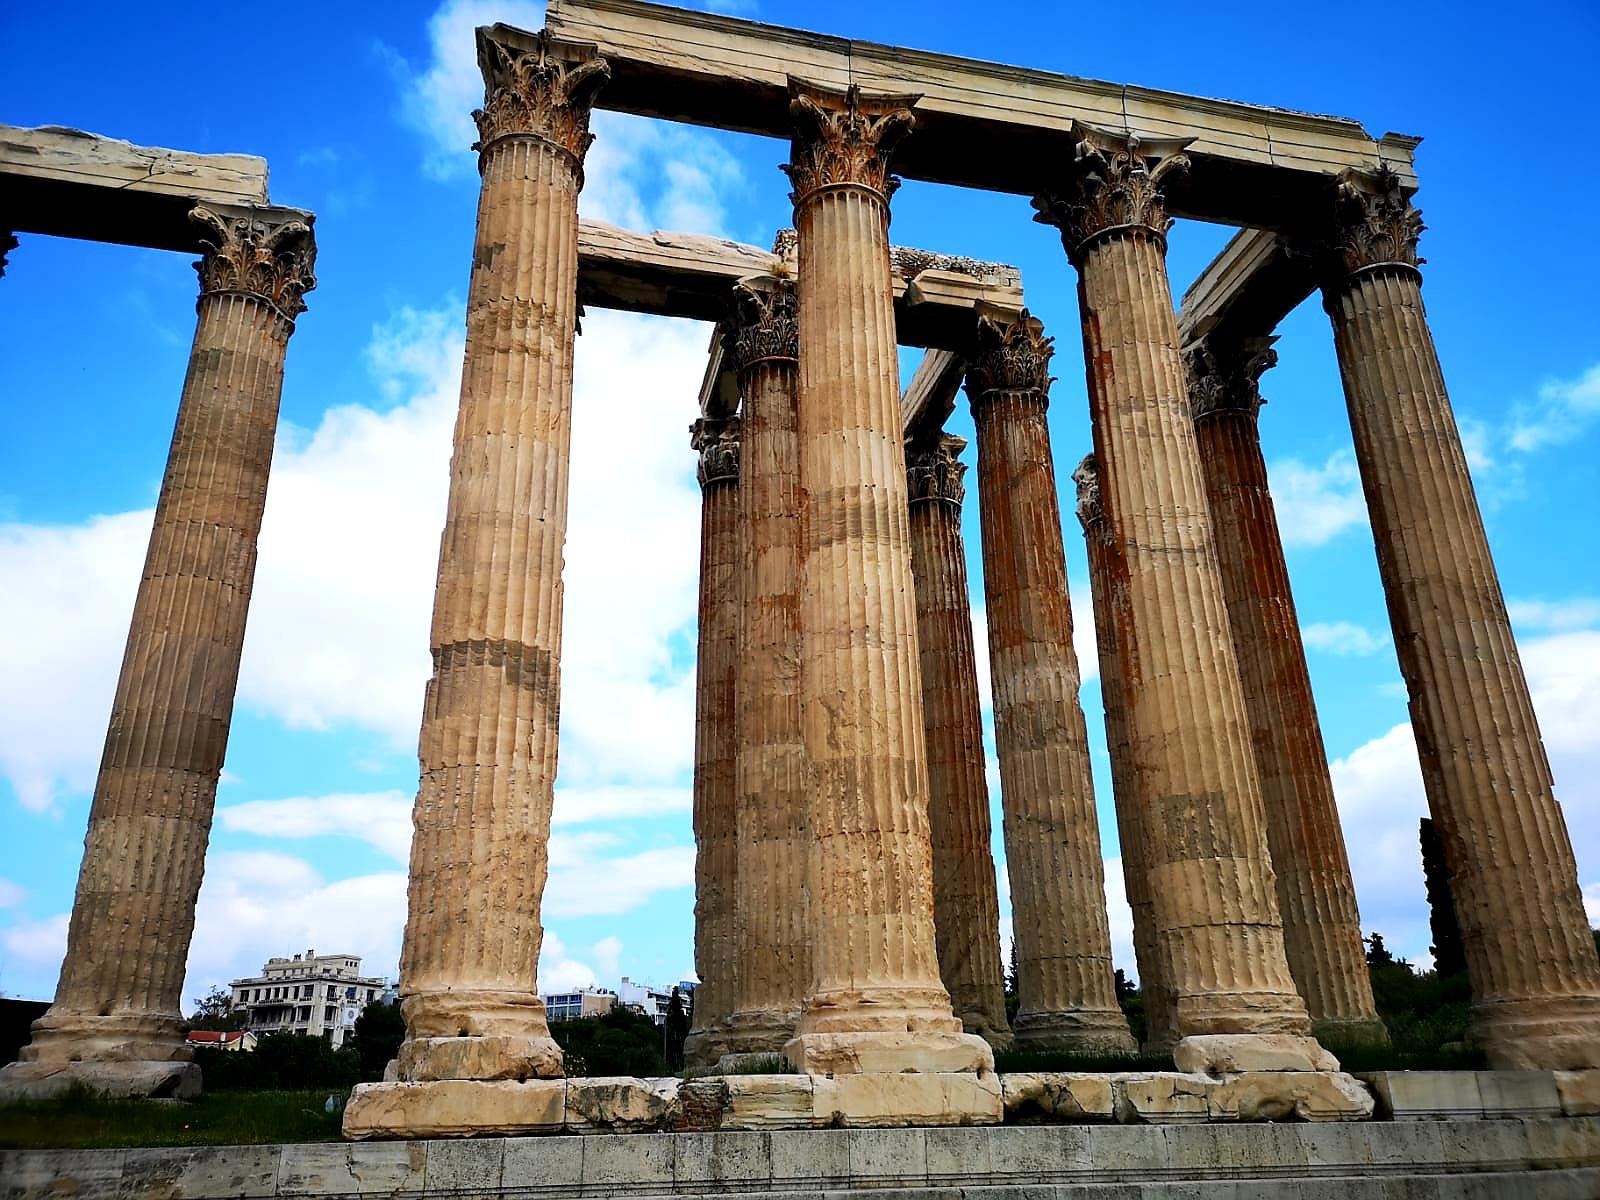 Temple of Olympian Zeus weekend in Athens